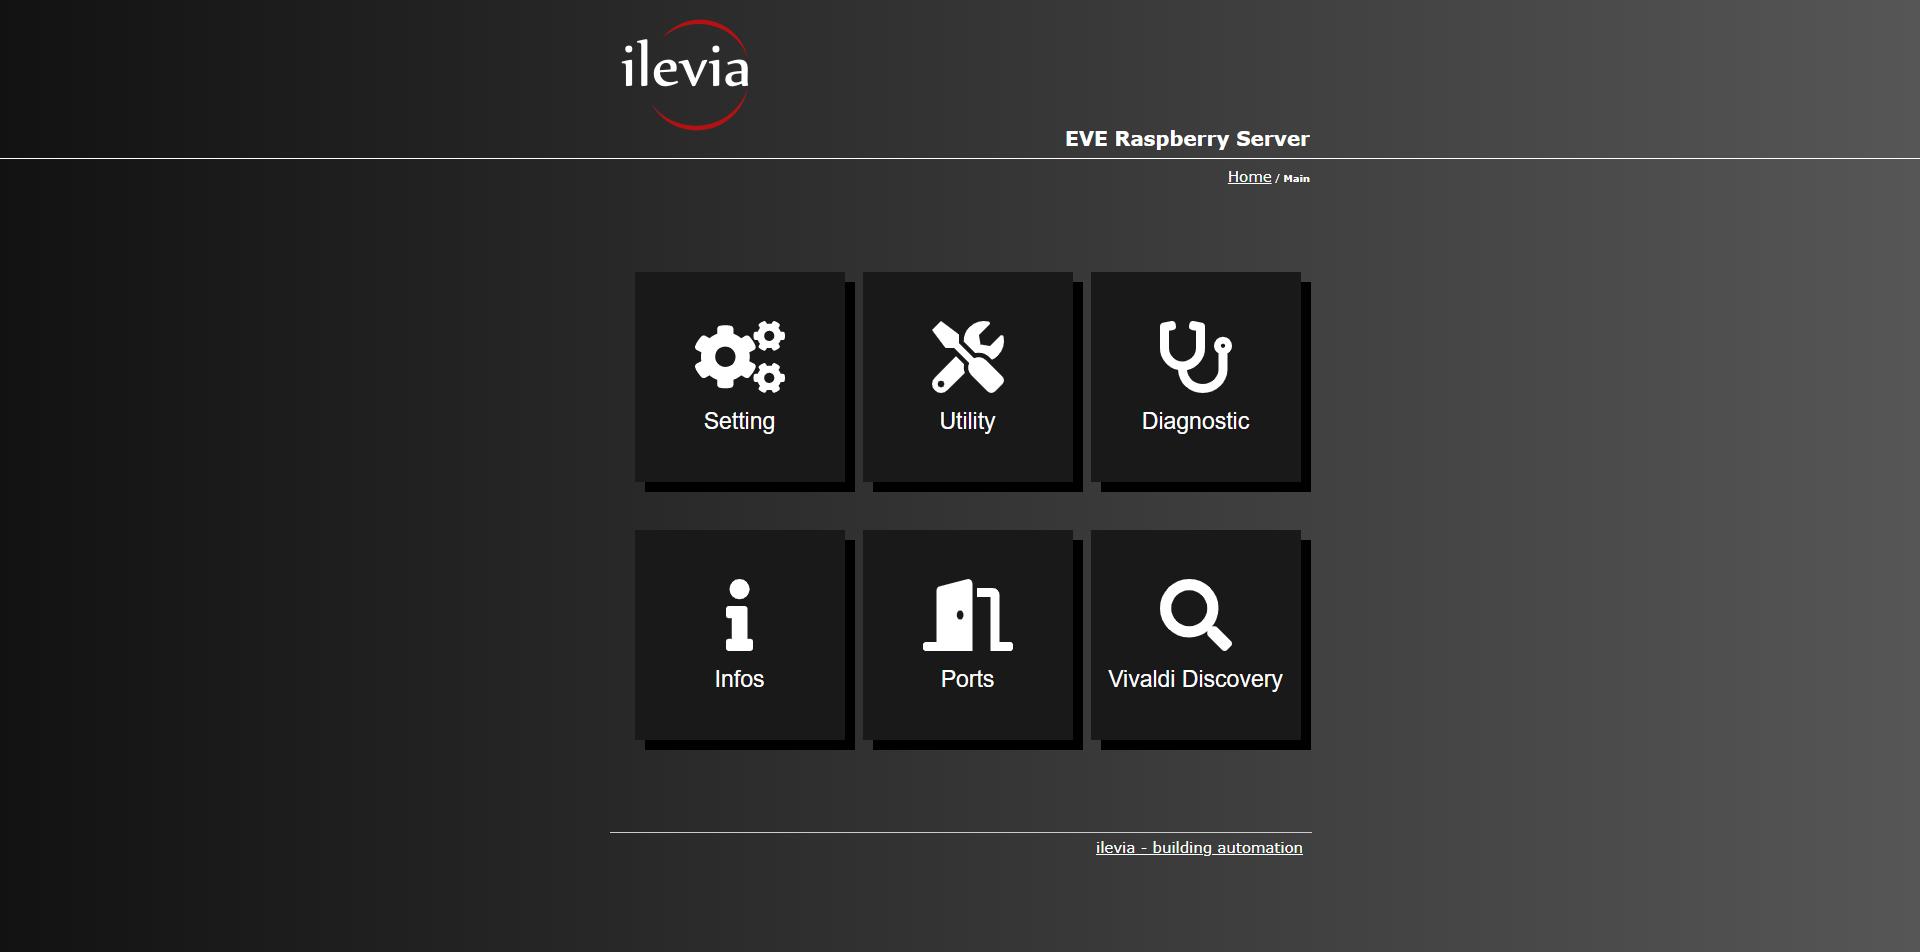 How the EVE X5's Home automation server Main menu